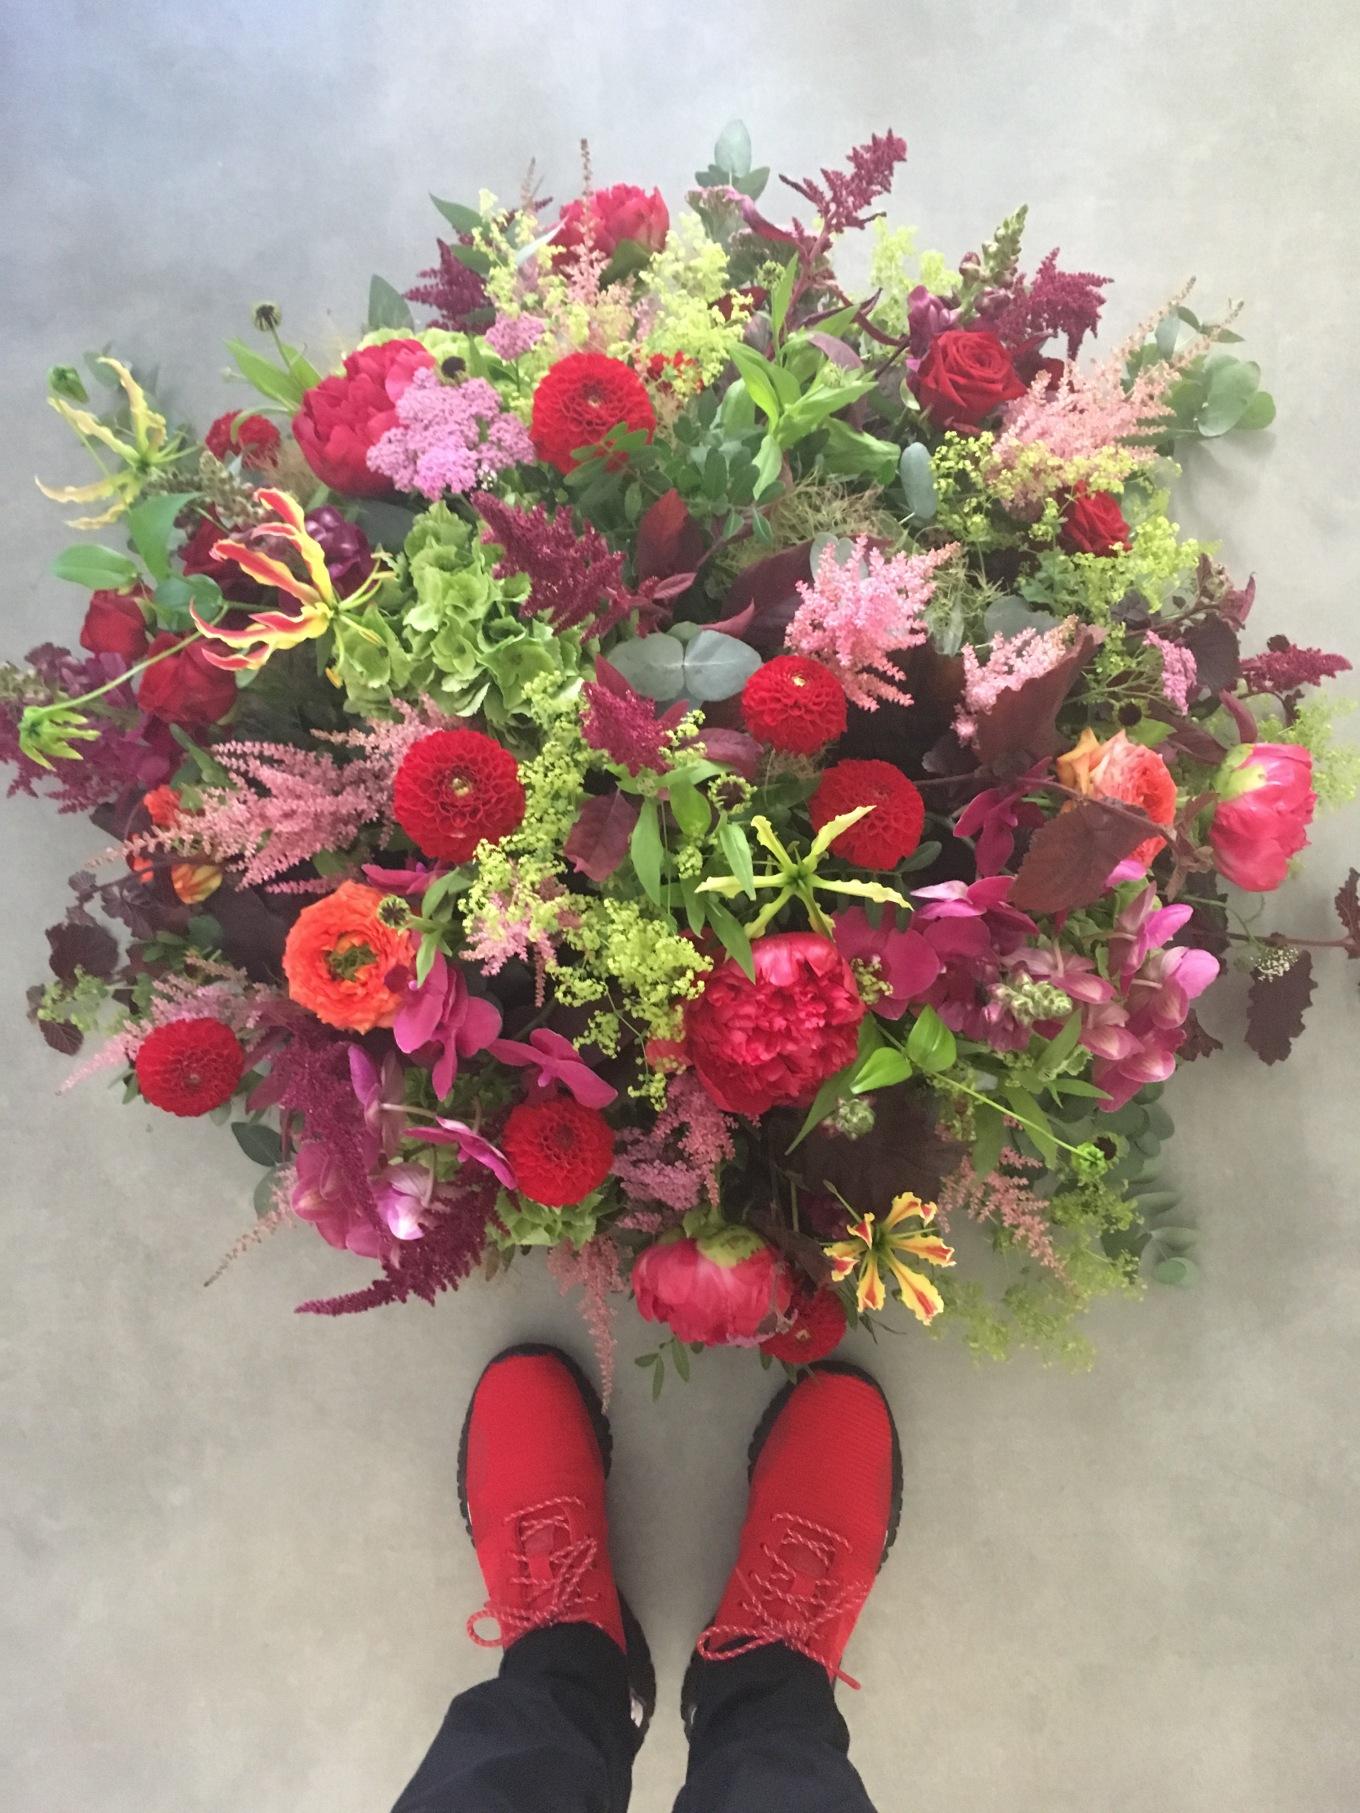 Rode rozen en rode schoenen